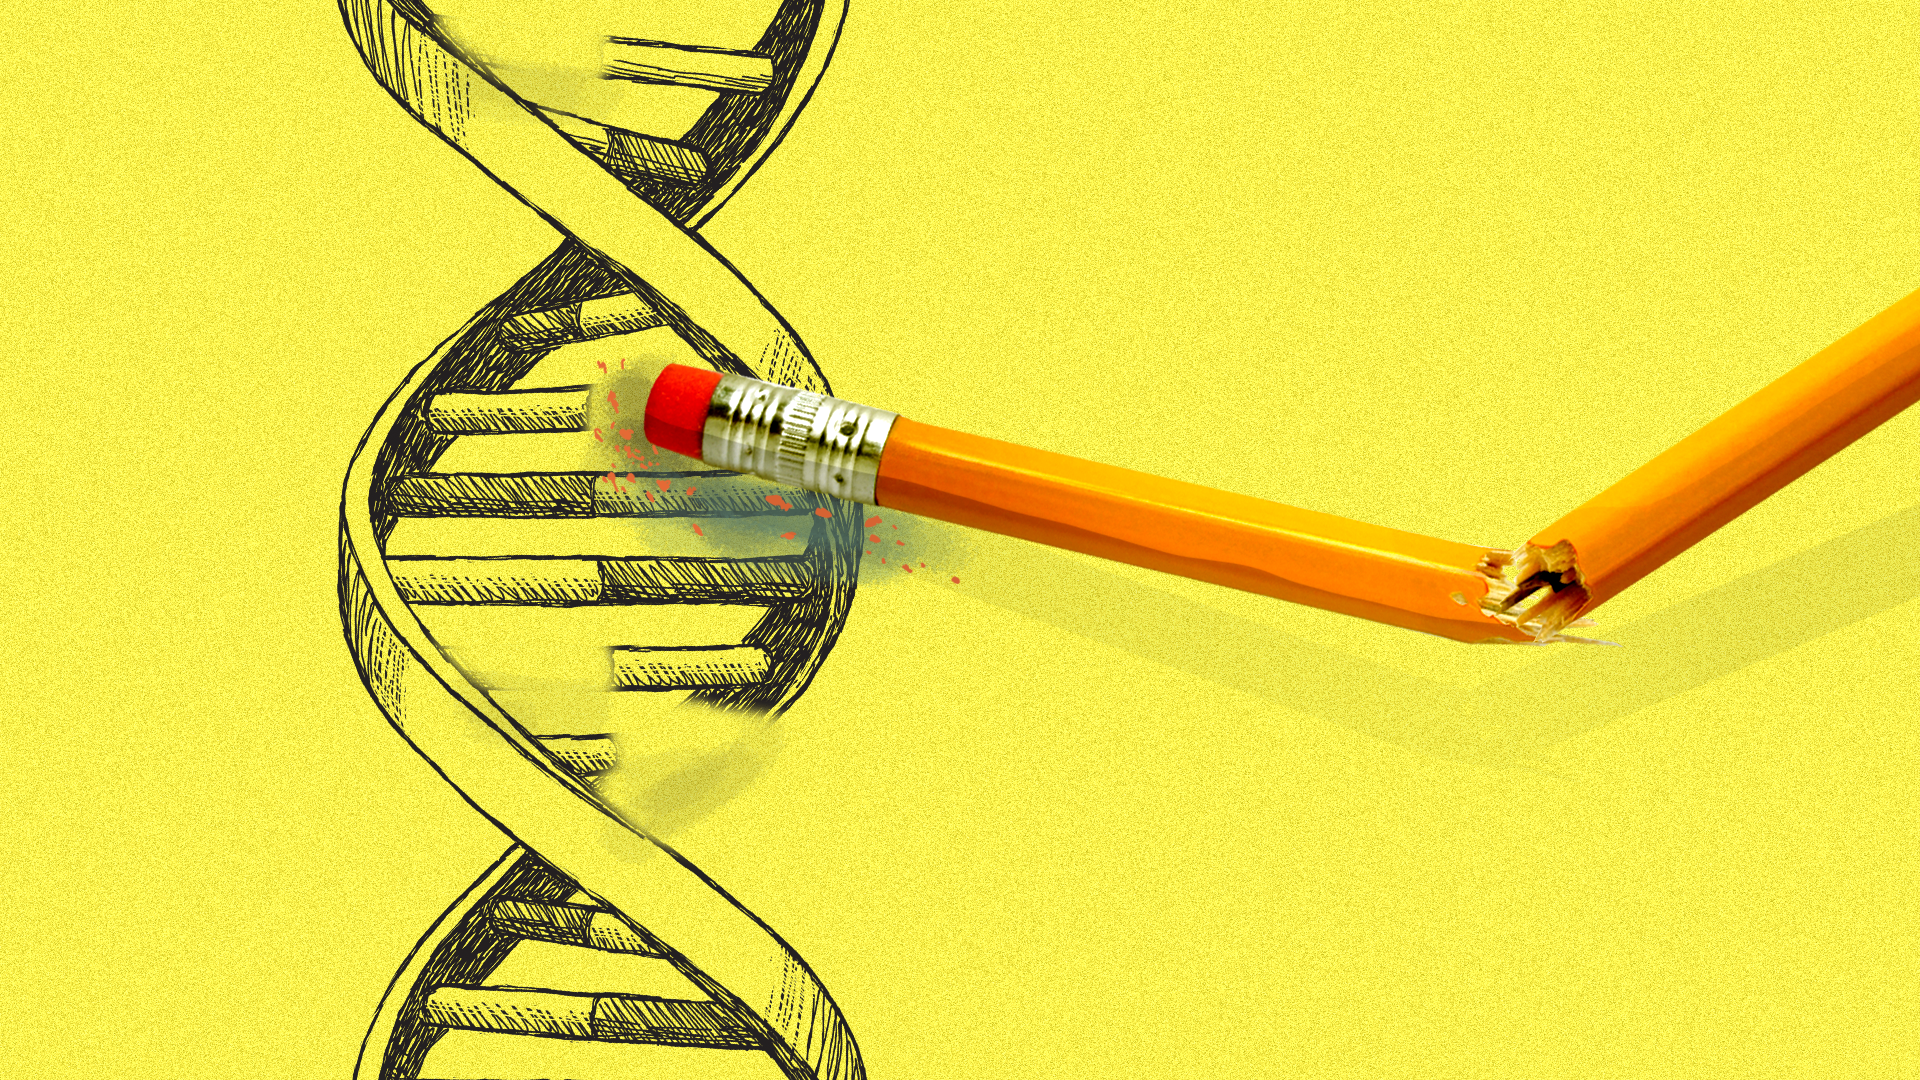 Illustration of breaking pencil erasing gene sequence